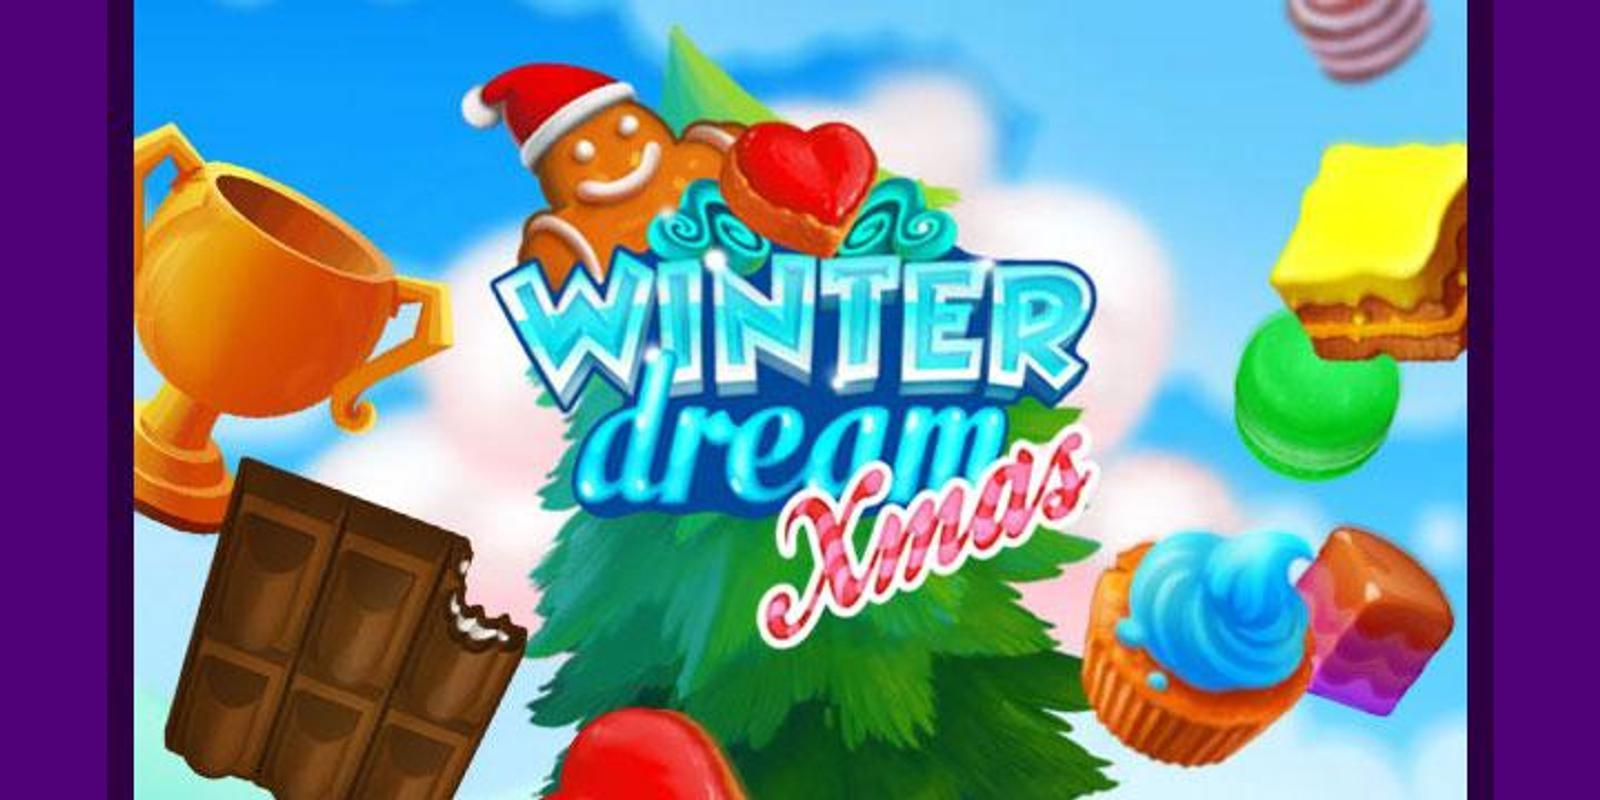 Juegos Gratis Online For Android Apk Download